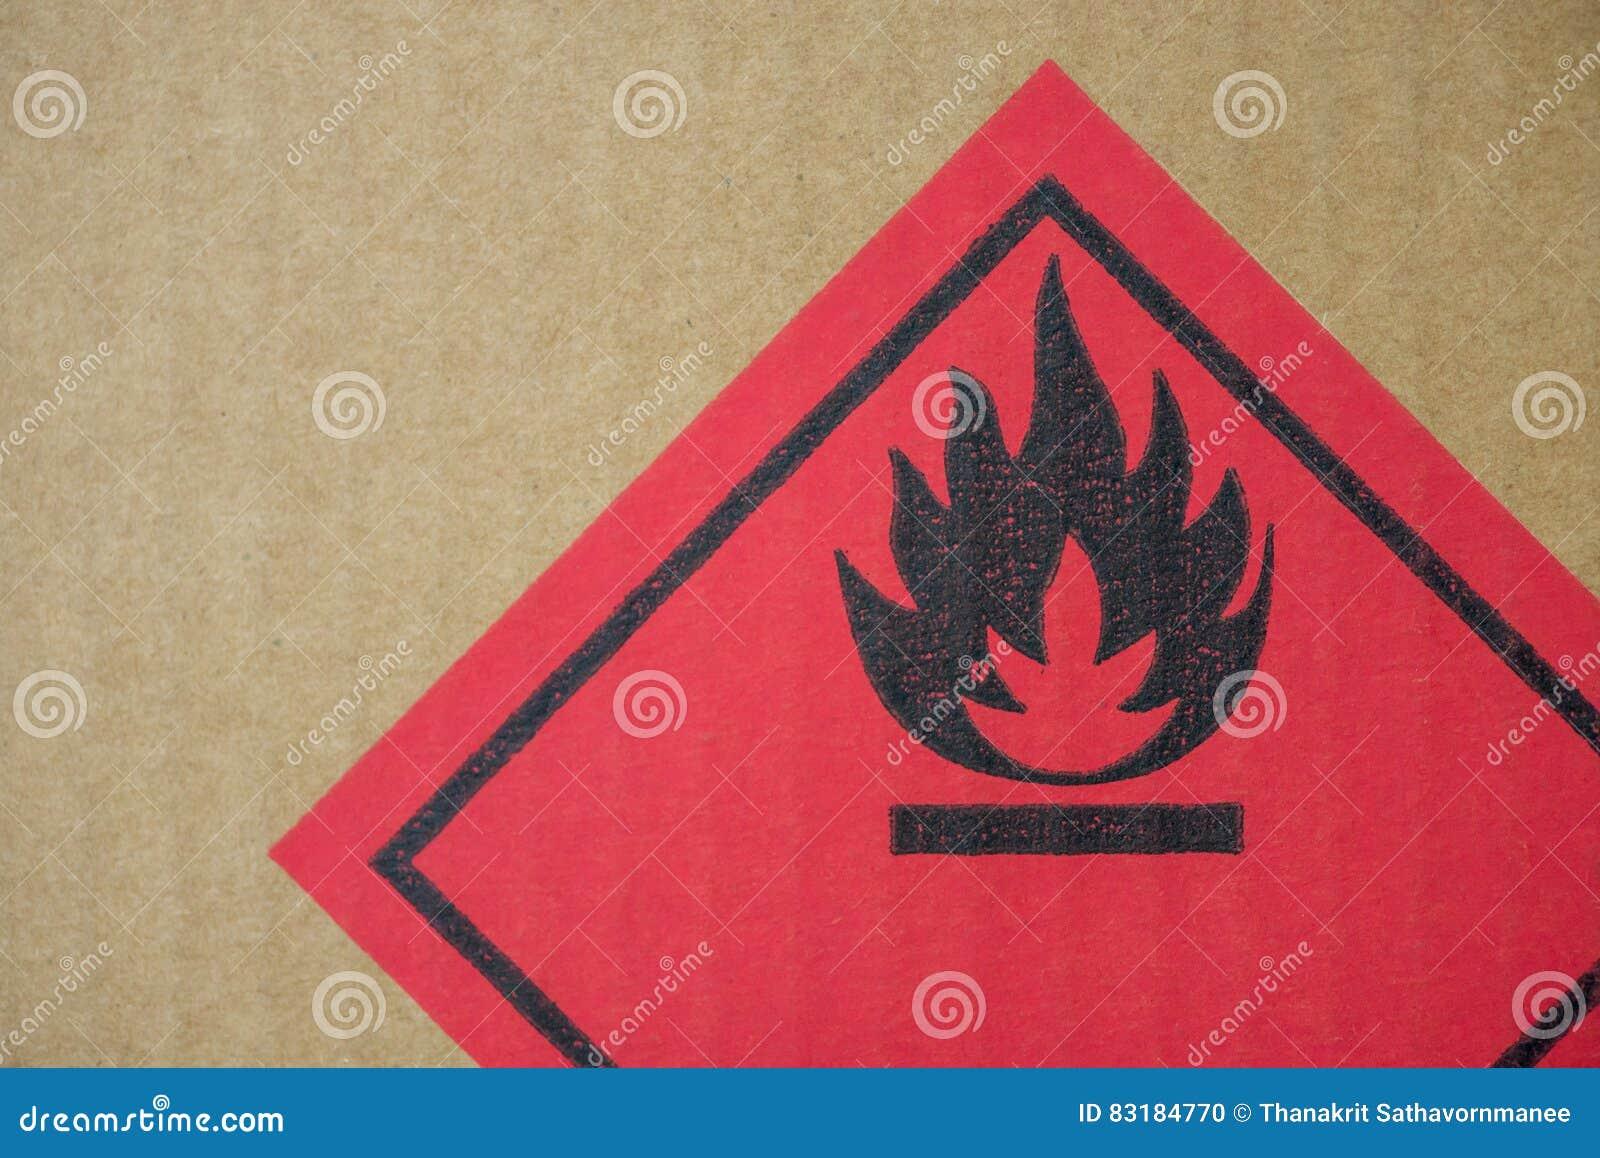 Fire Hazard Symbol On A Cardboard Box Stock Photo Image Of Injury